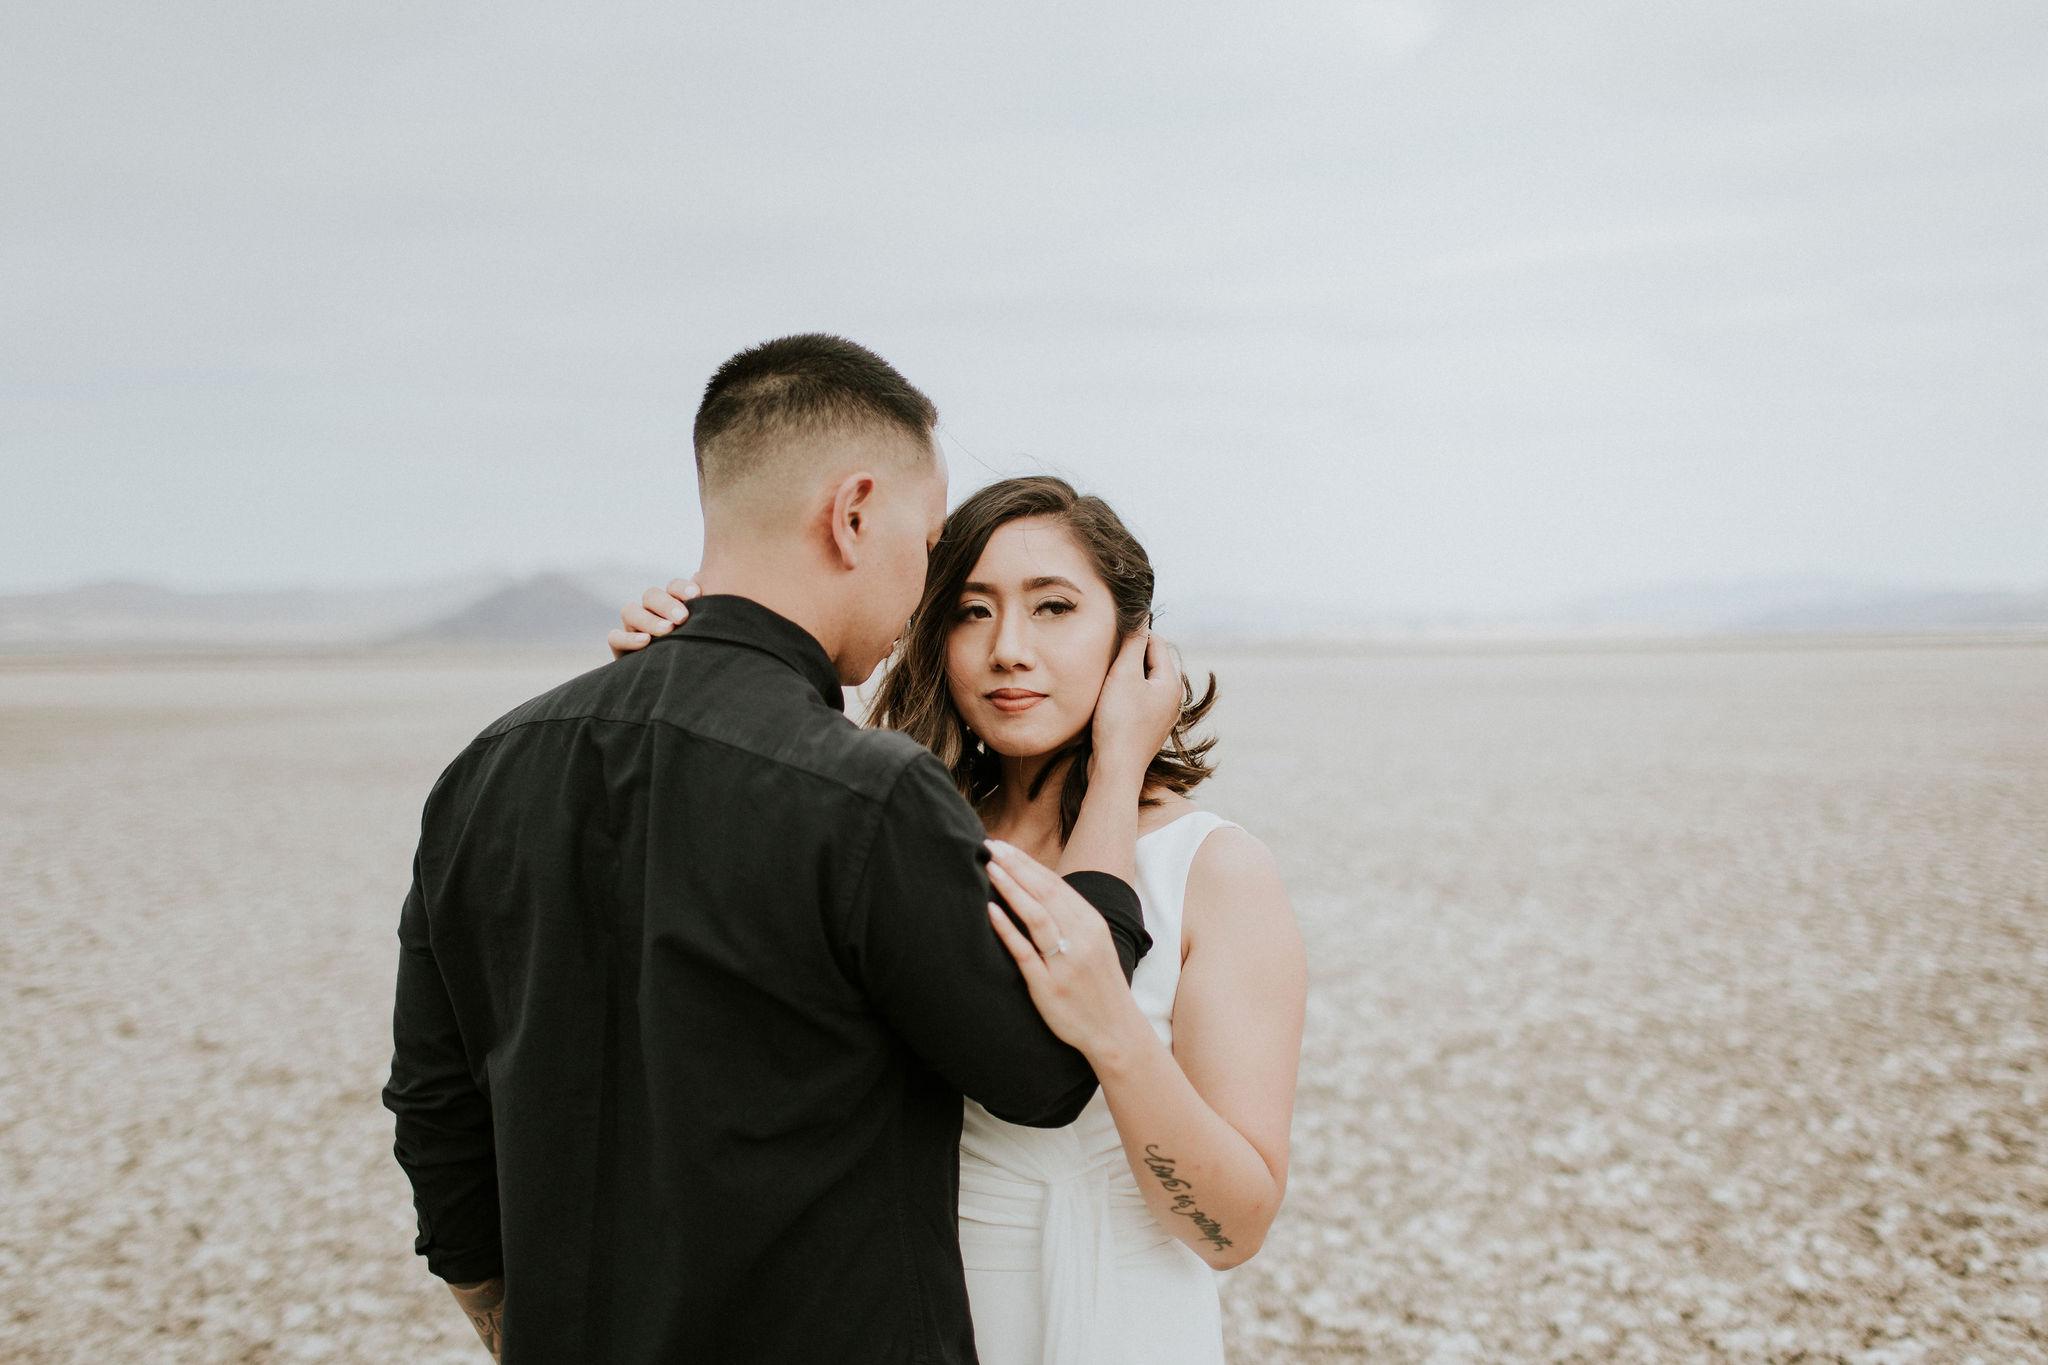 jamilaree-desert-engagementsession-12.jpg